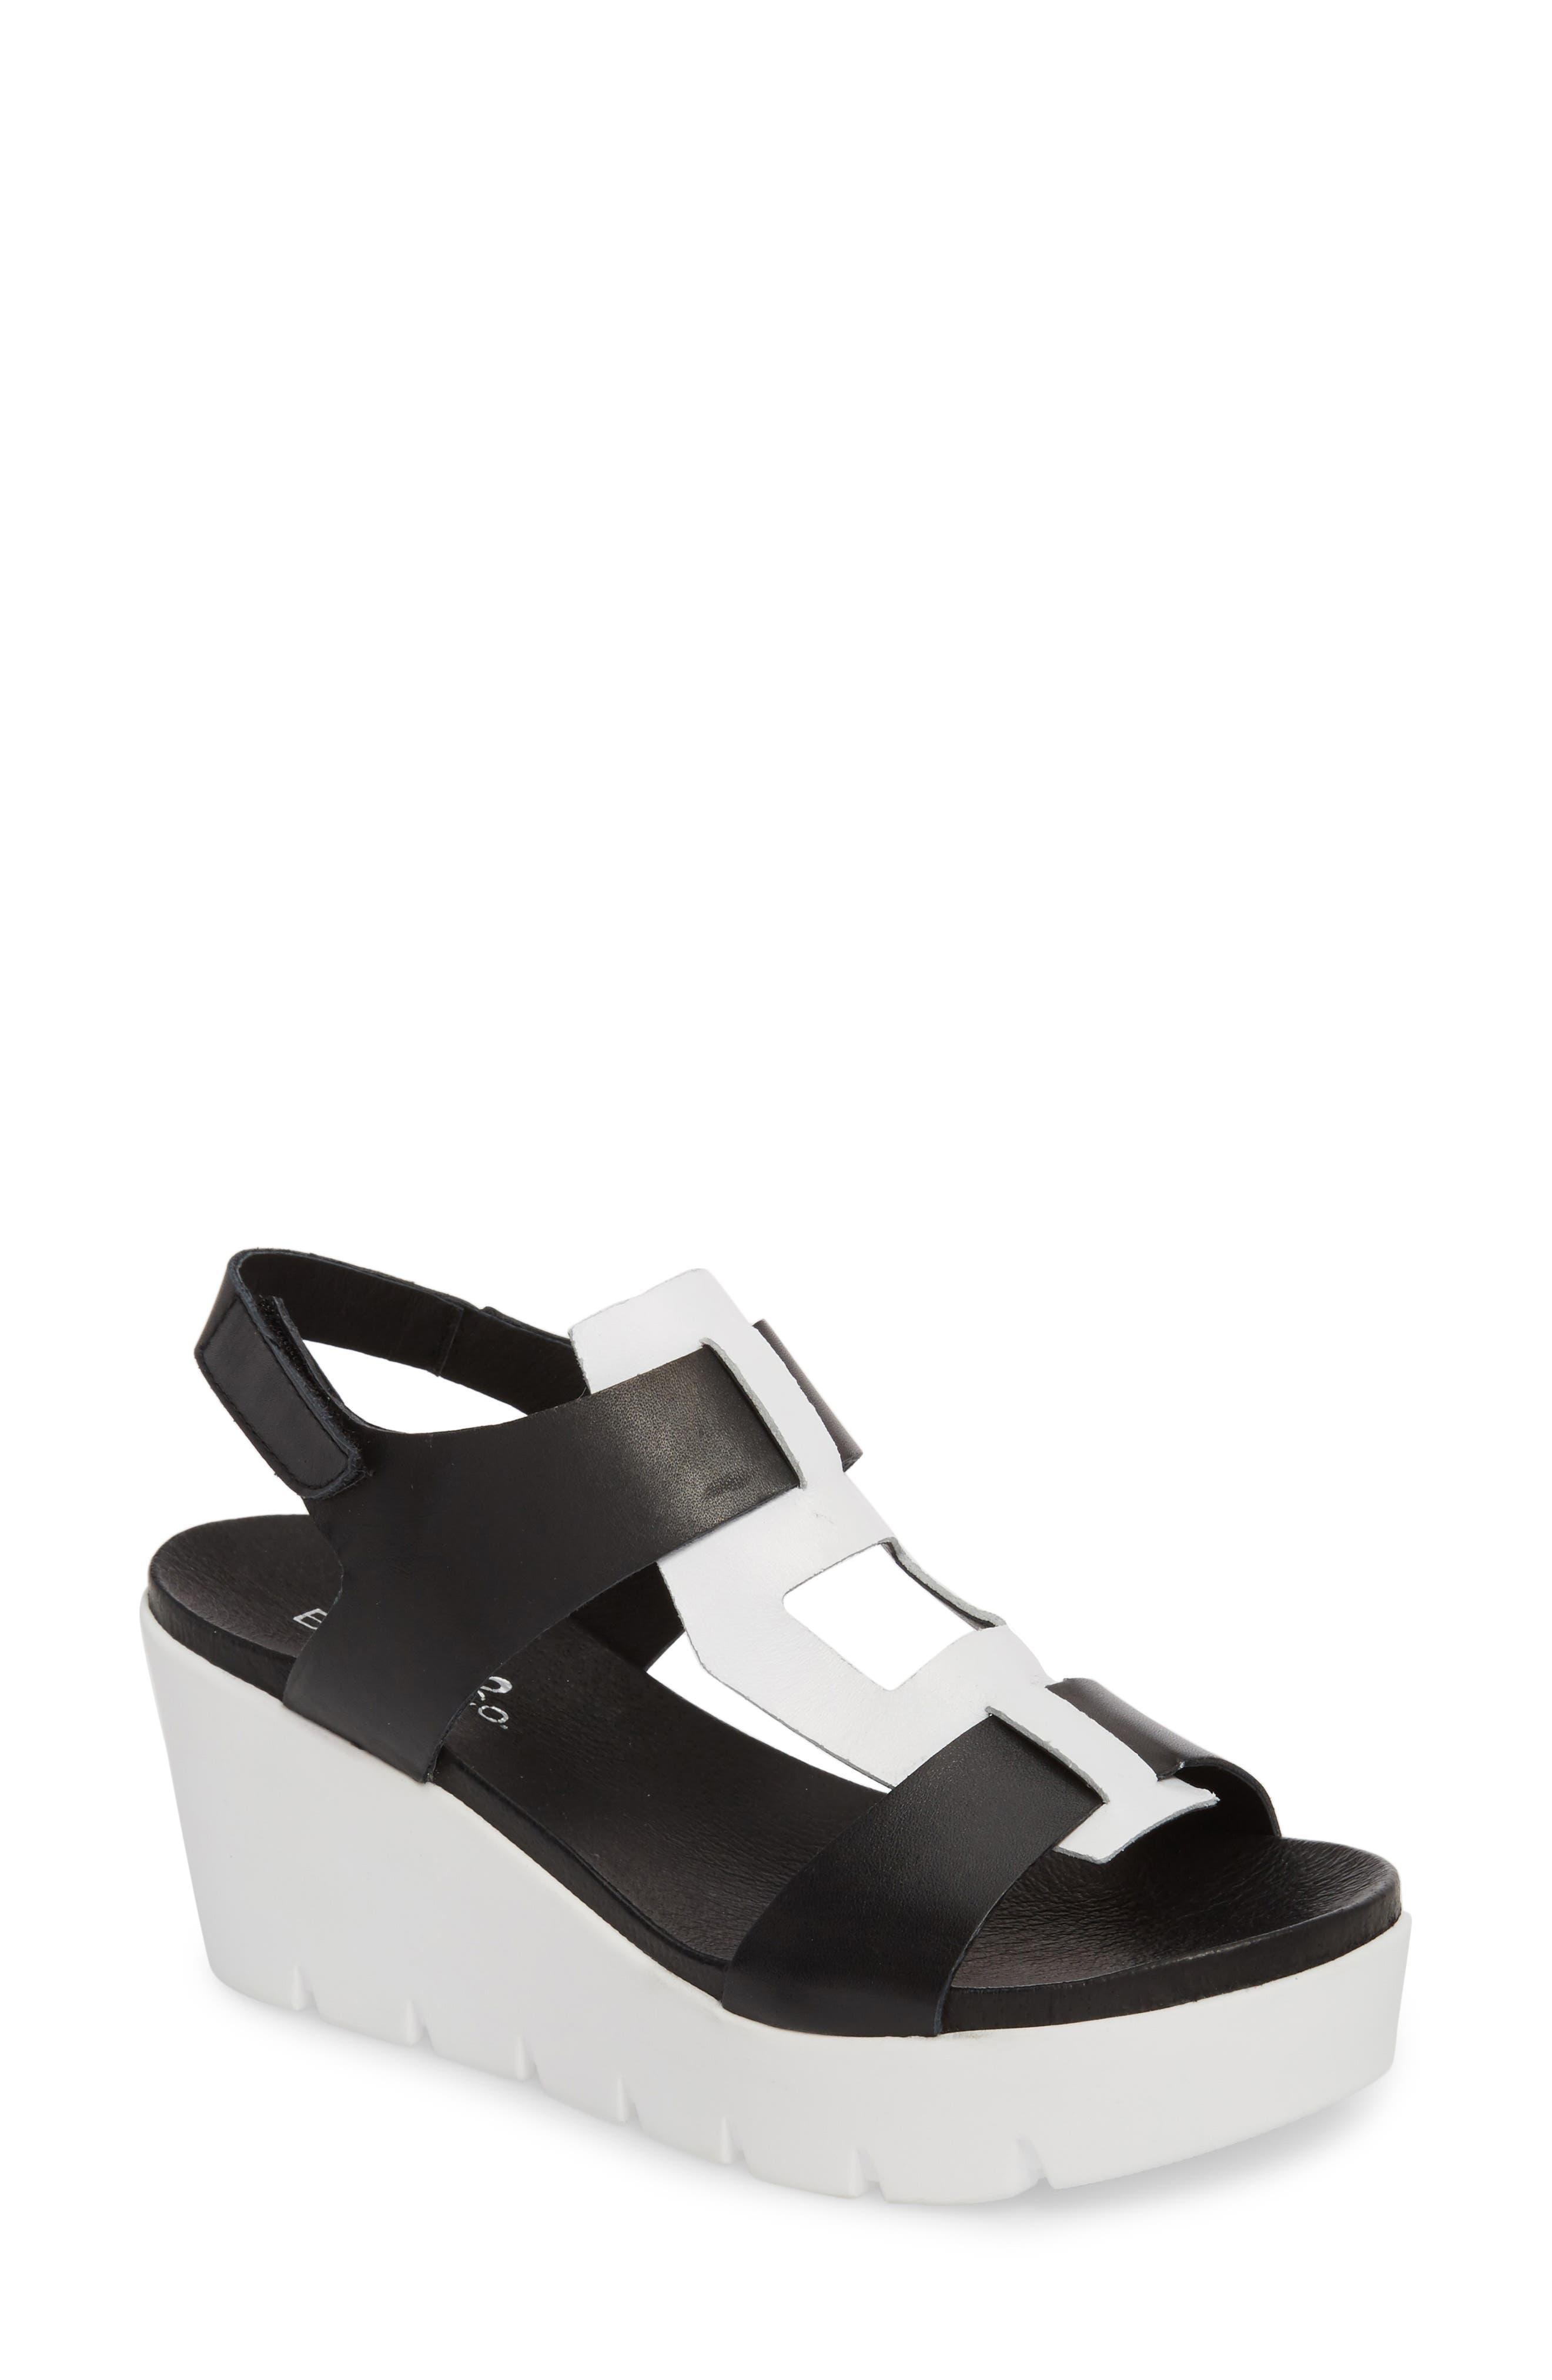 Somo Platform Wedge Sandal,                             Main thumbnail 1, color,                             BLACK/ WHITE SMOOTH LEATHER